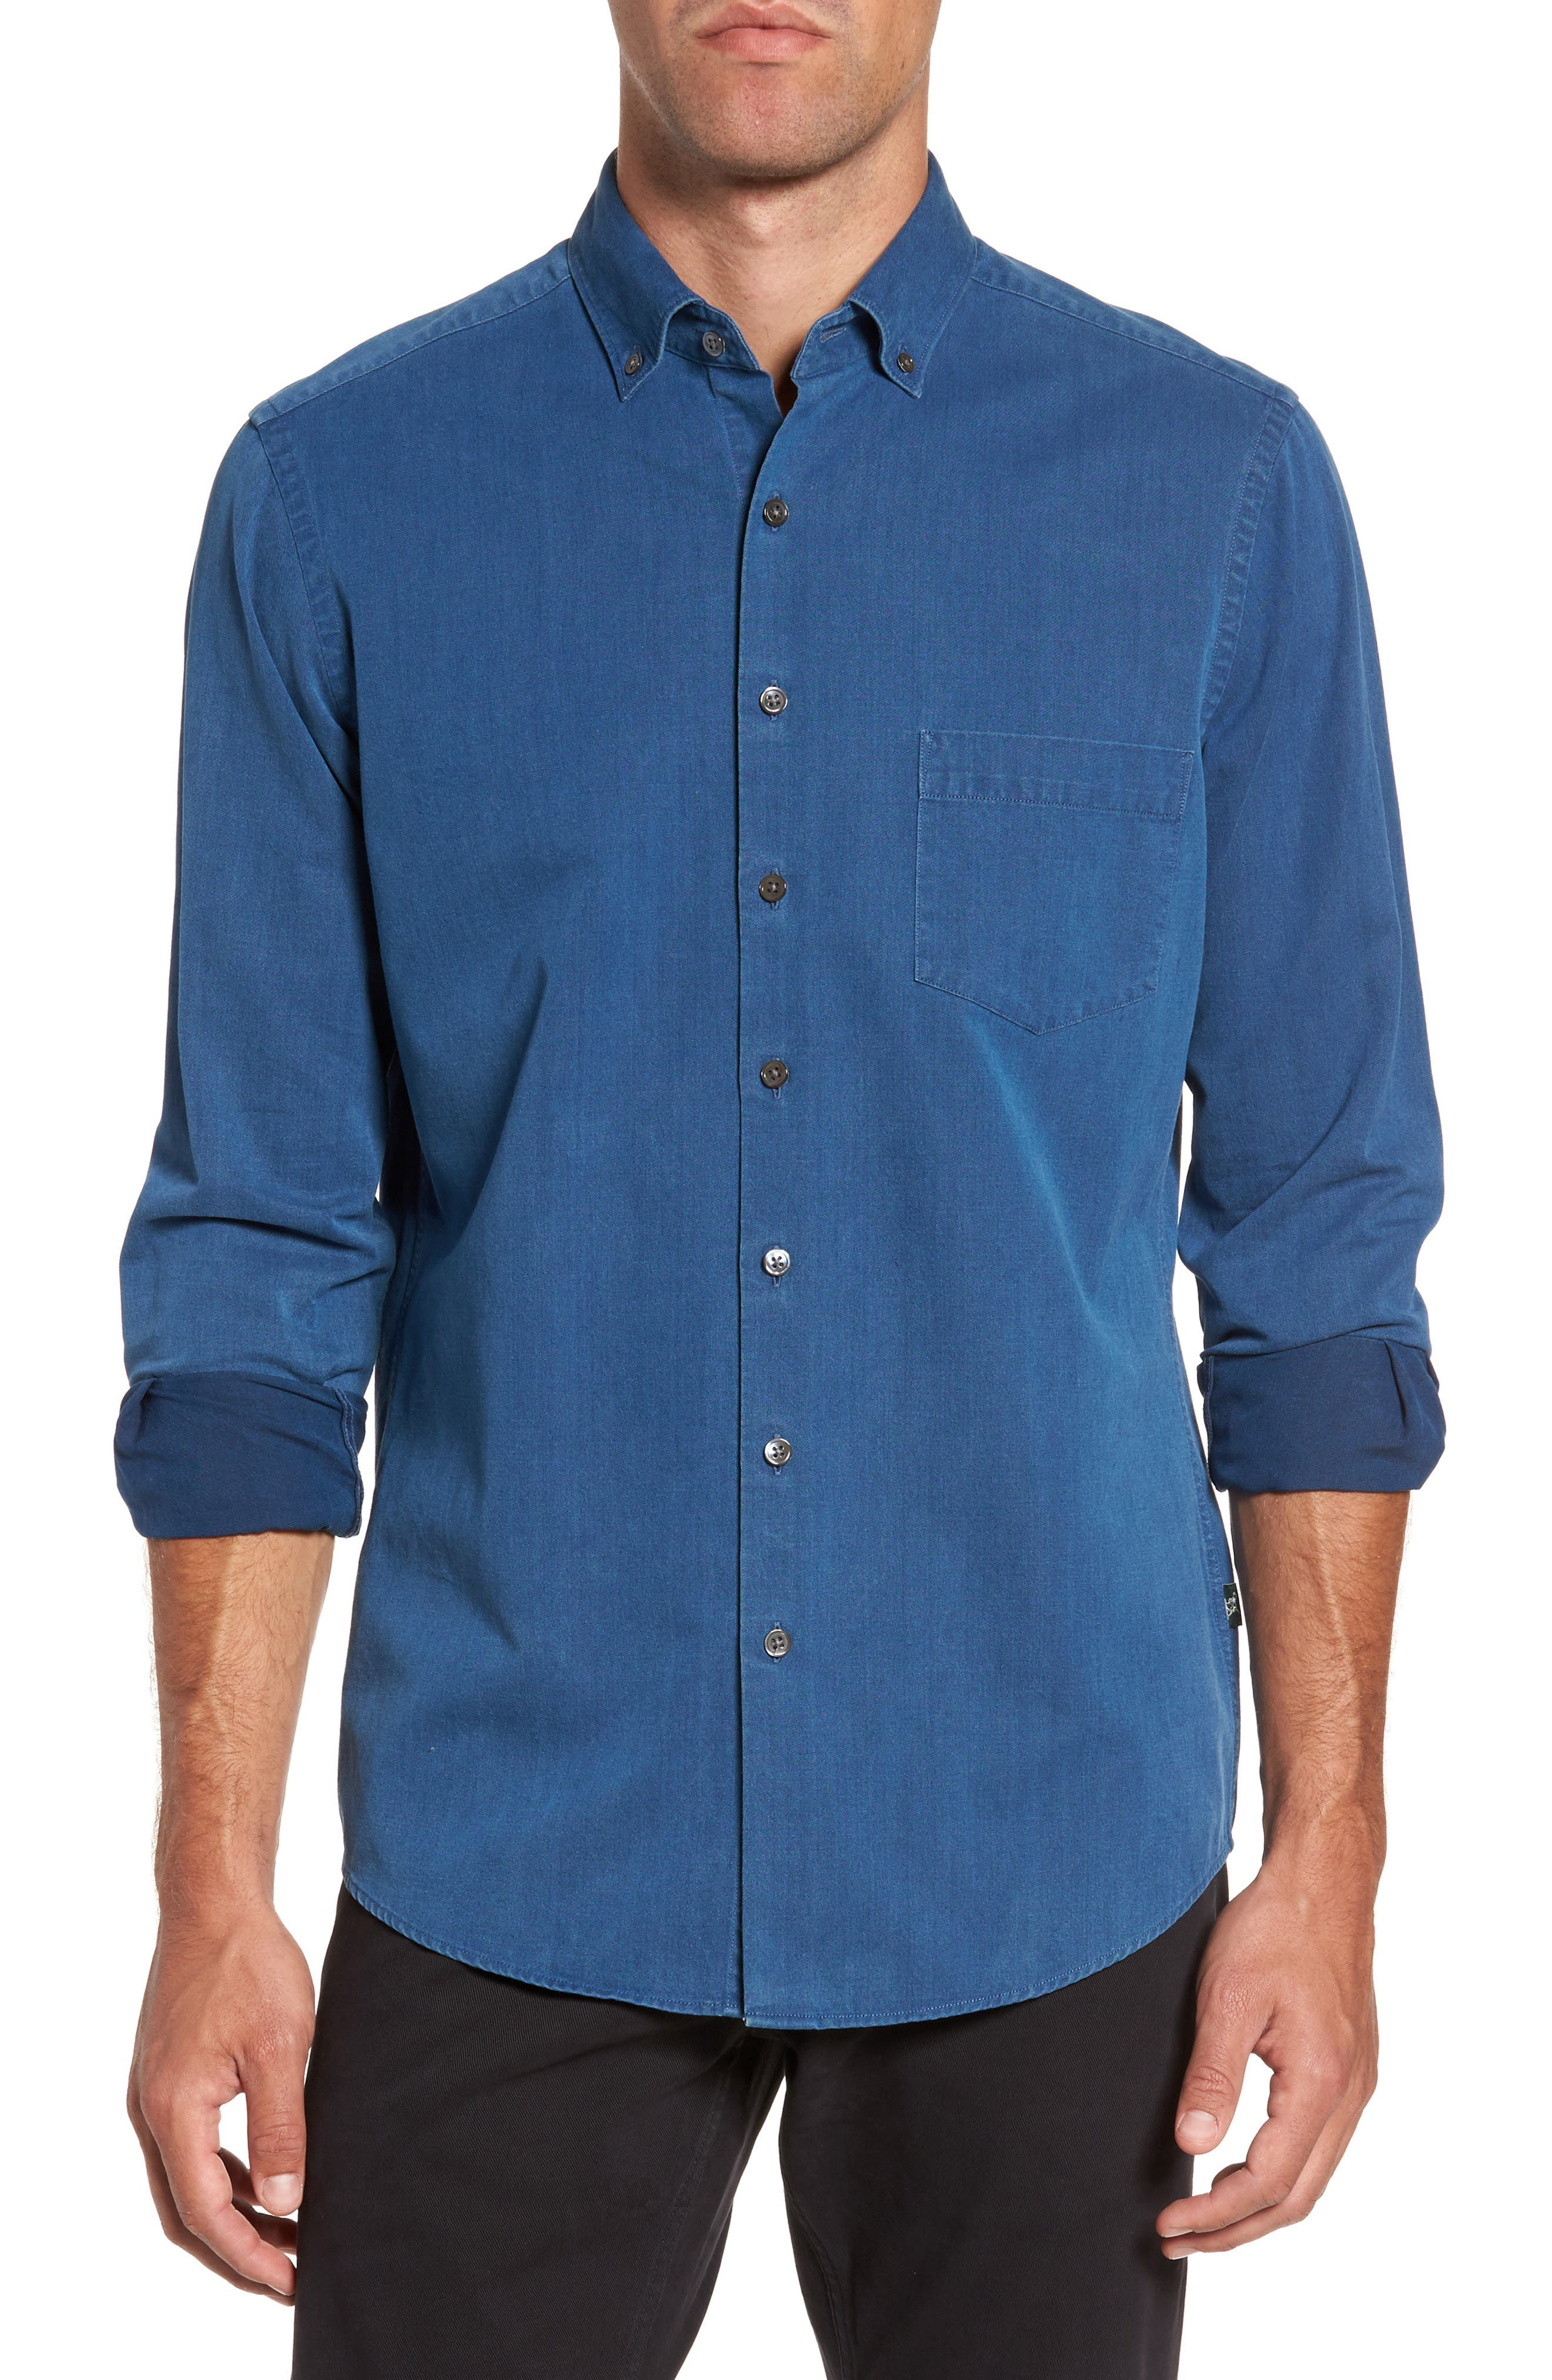 Alternate Image 1 Selected - Rodd & Gunn Bayswater Sports Fit Sport Shirt